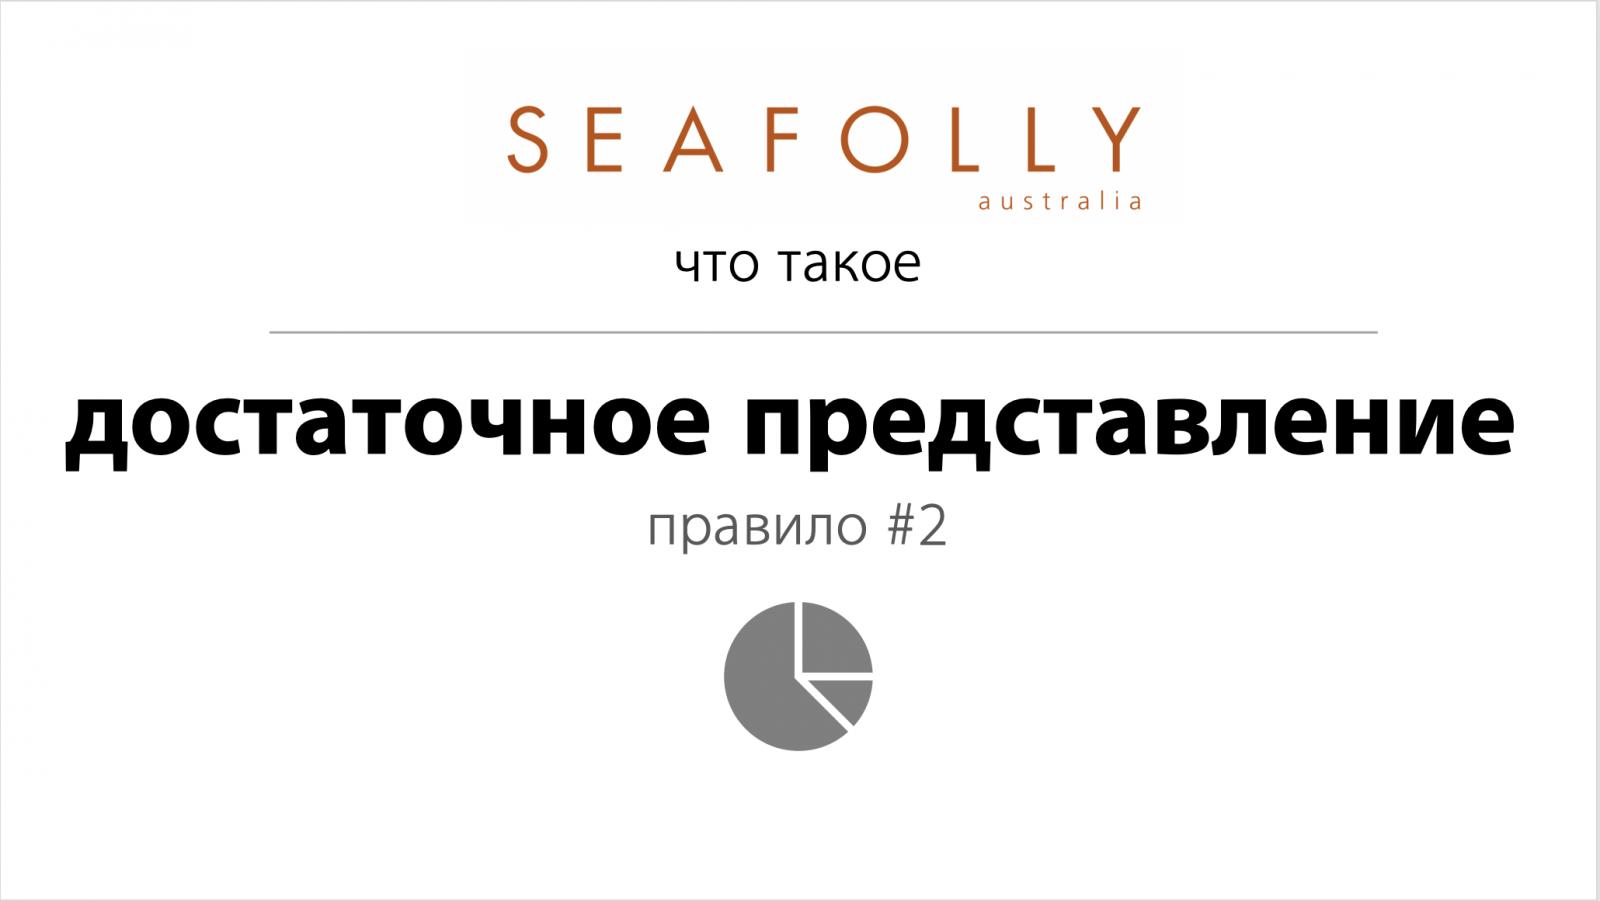 SF31-1 SEAFOLLY